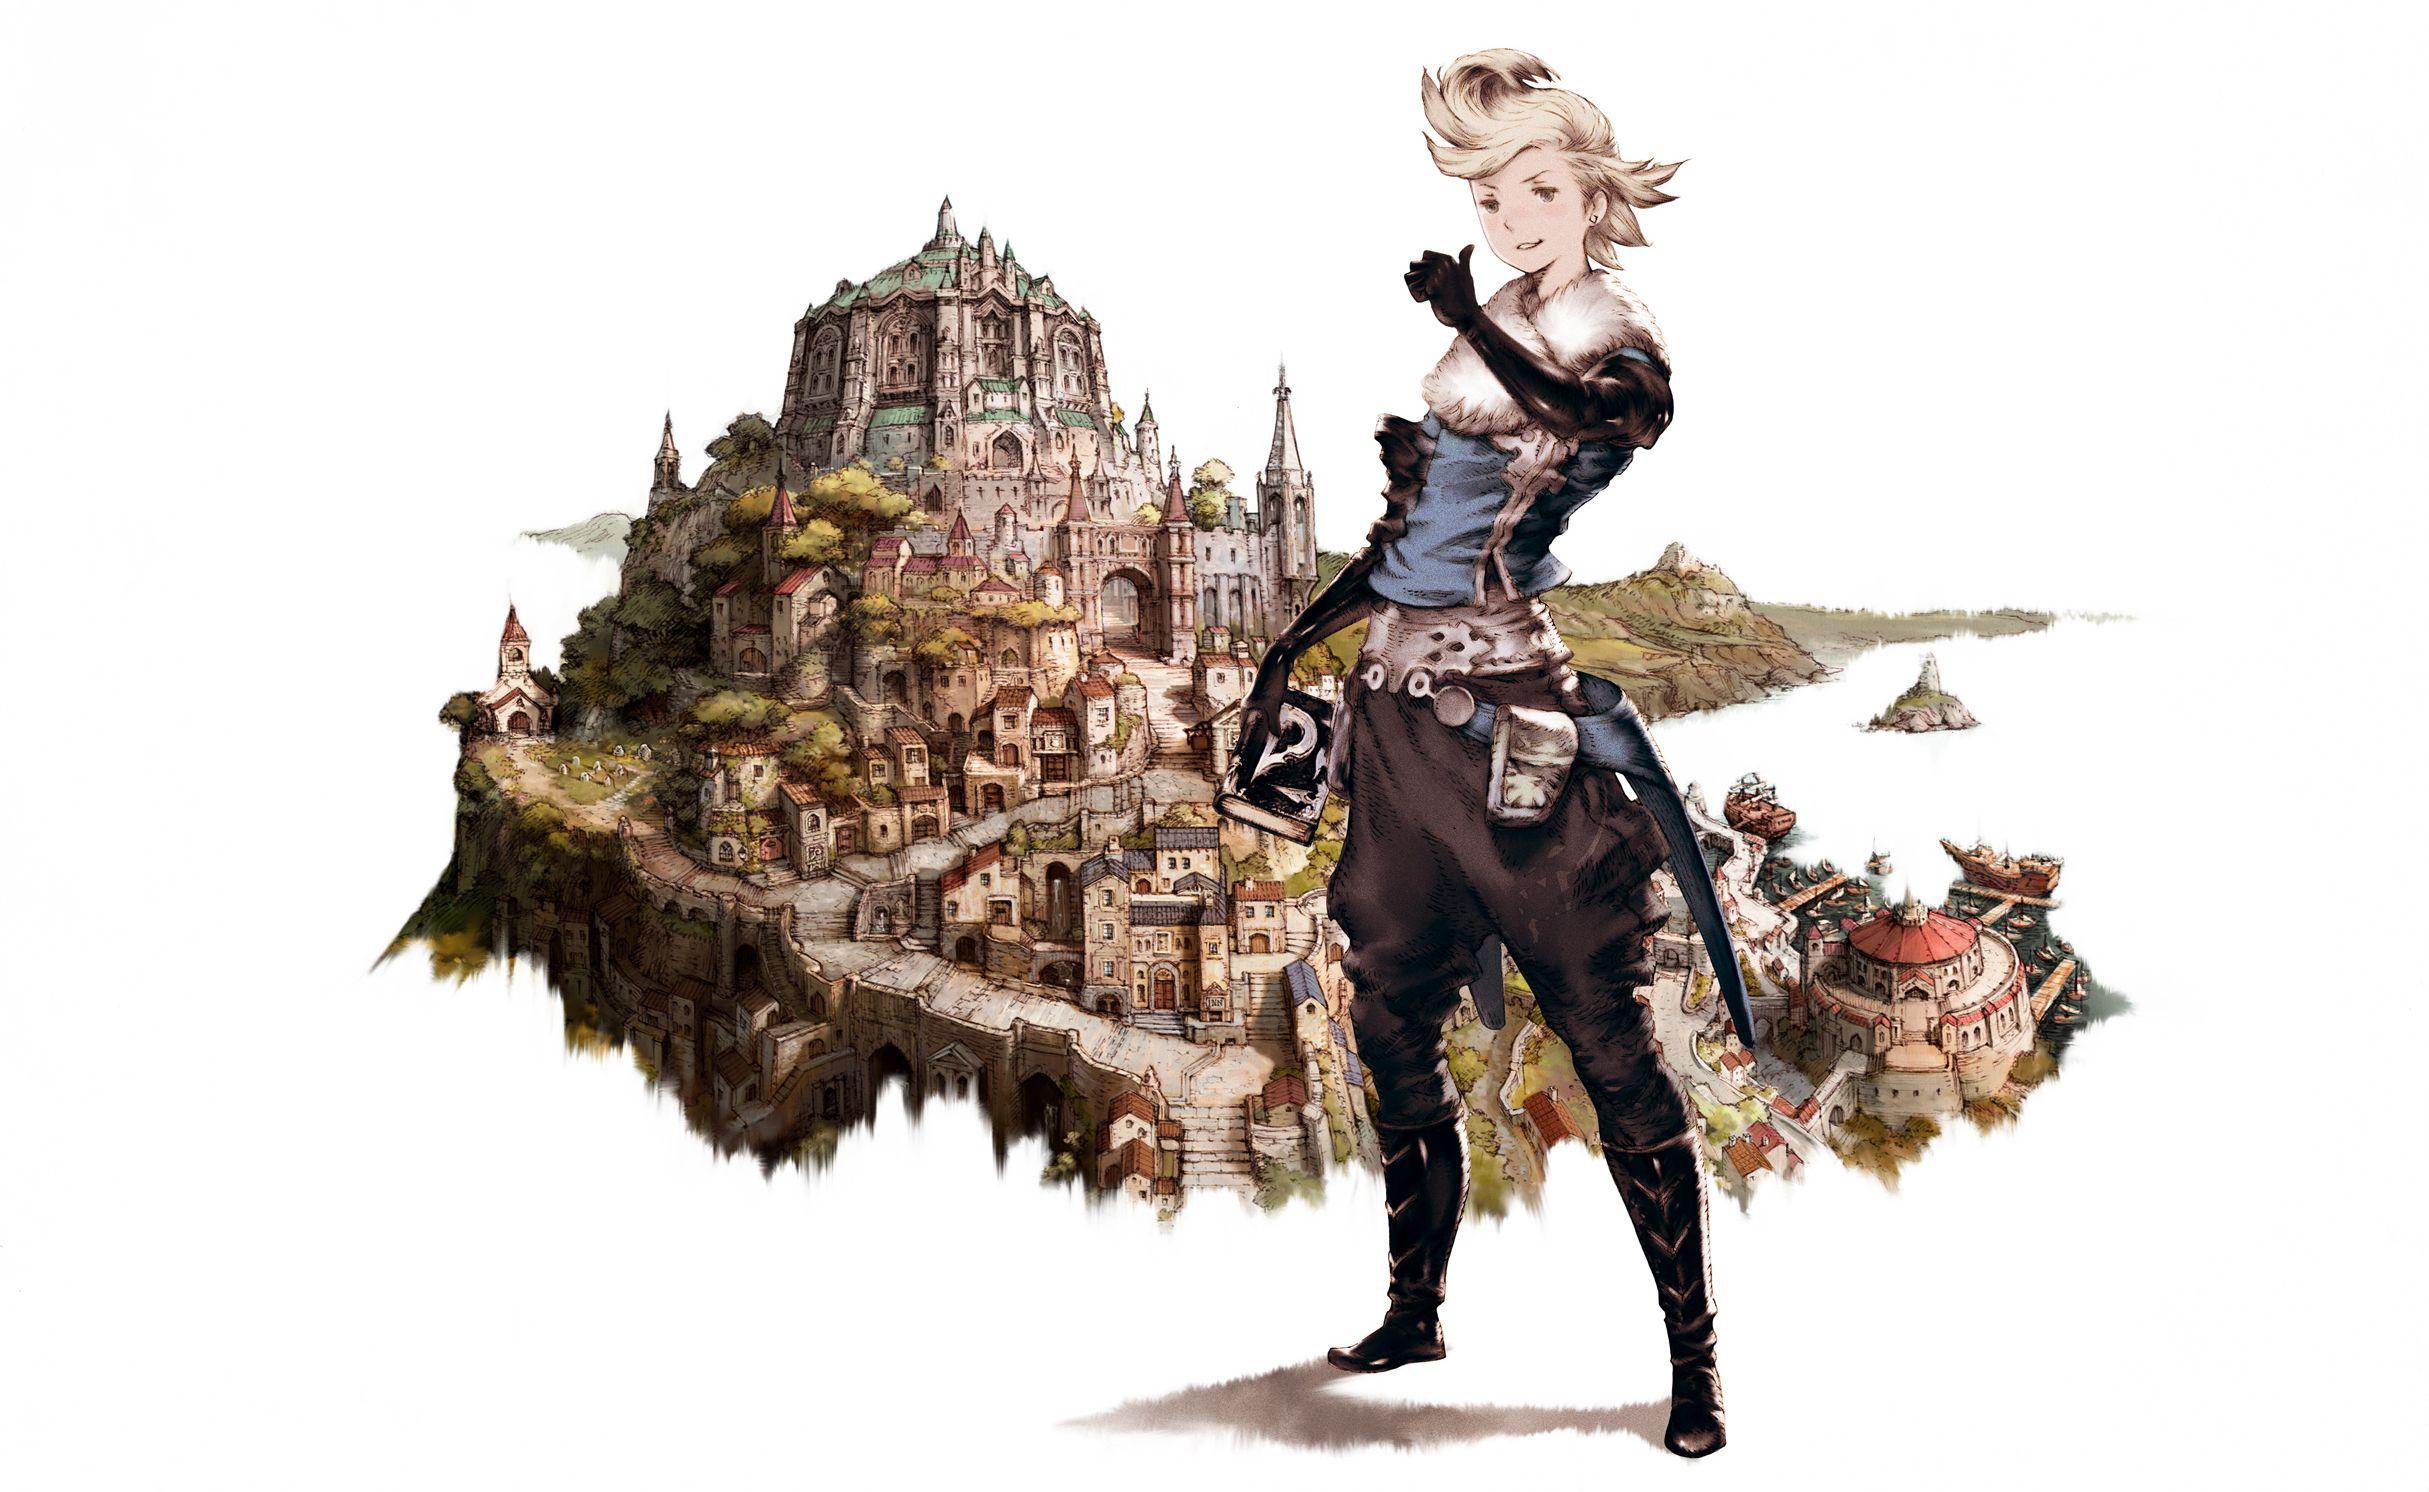 Bravely Default – more popular than Final Fantasy